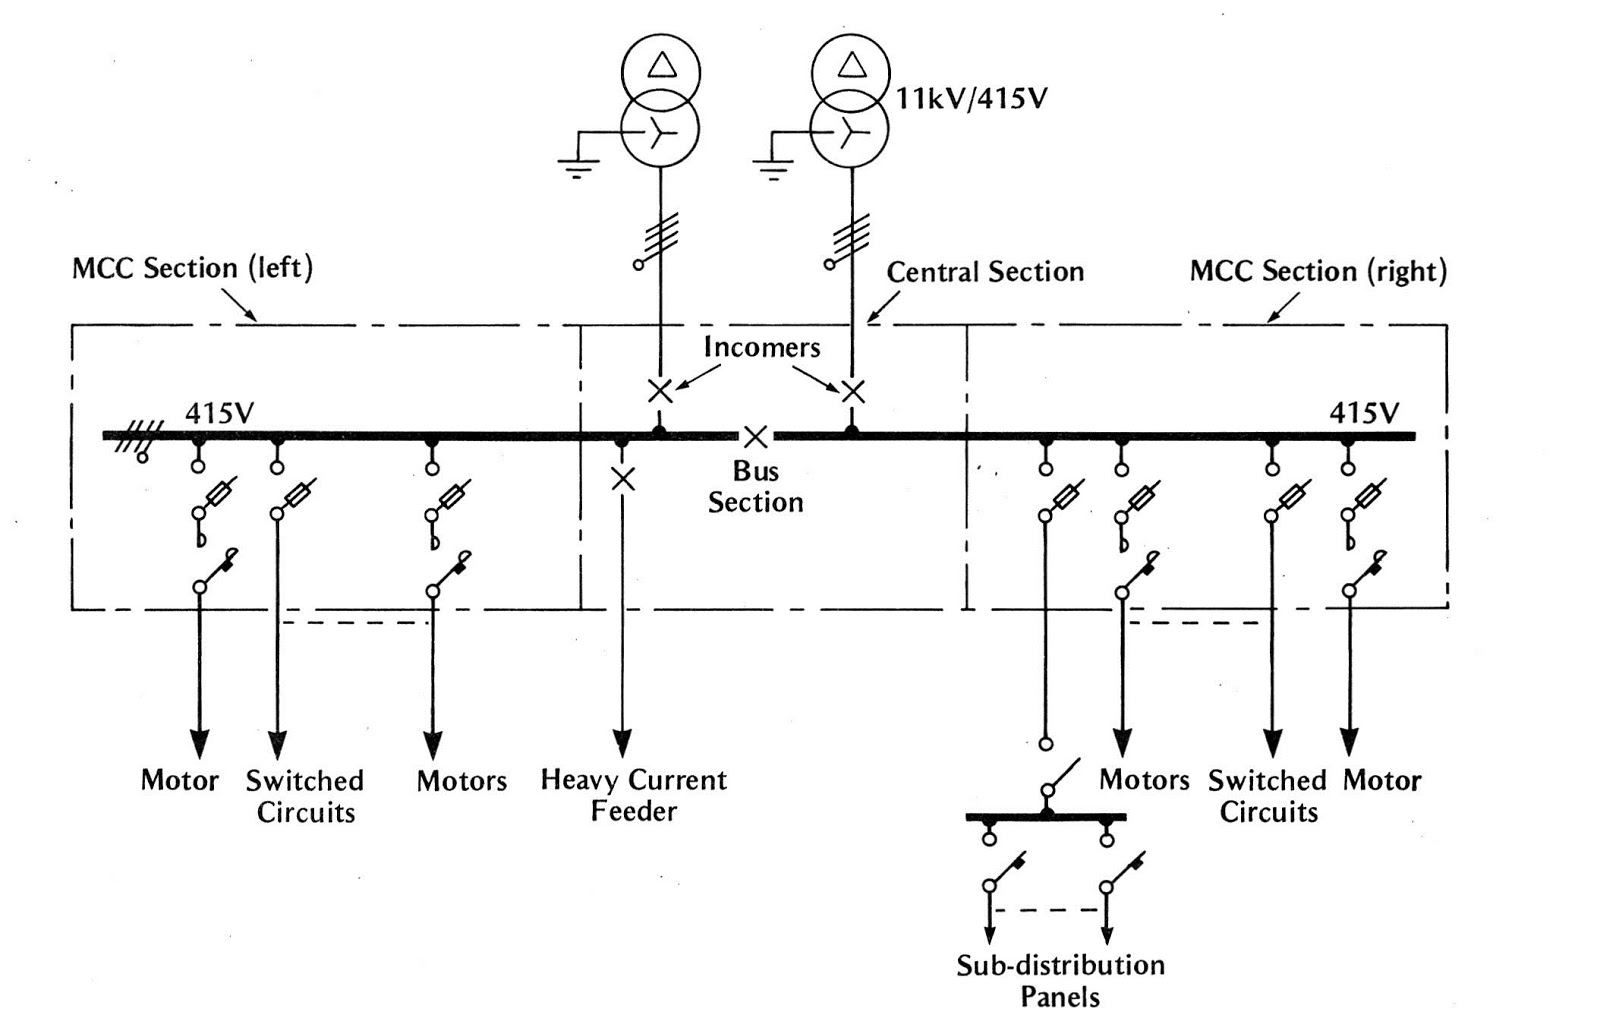 hight resolution of low voltage wiring diagram symbols chapter 3 low voltage switchgear lekule blog design